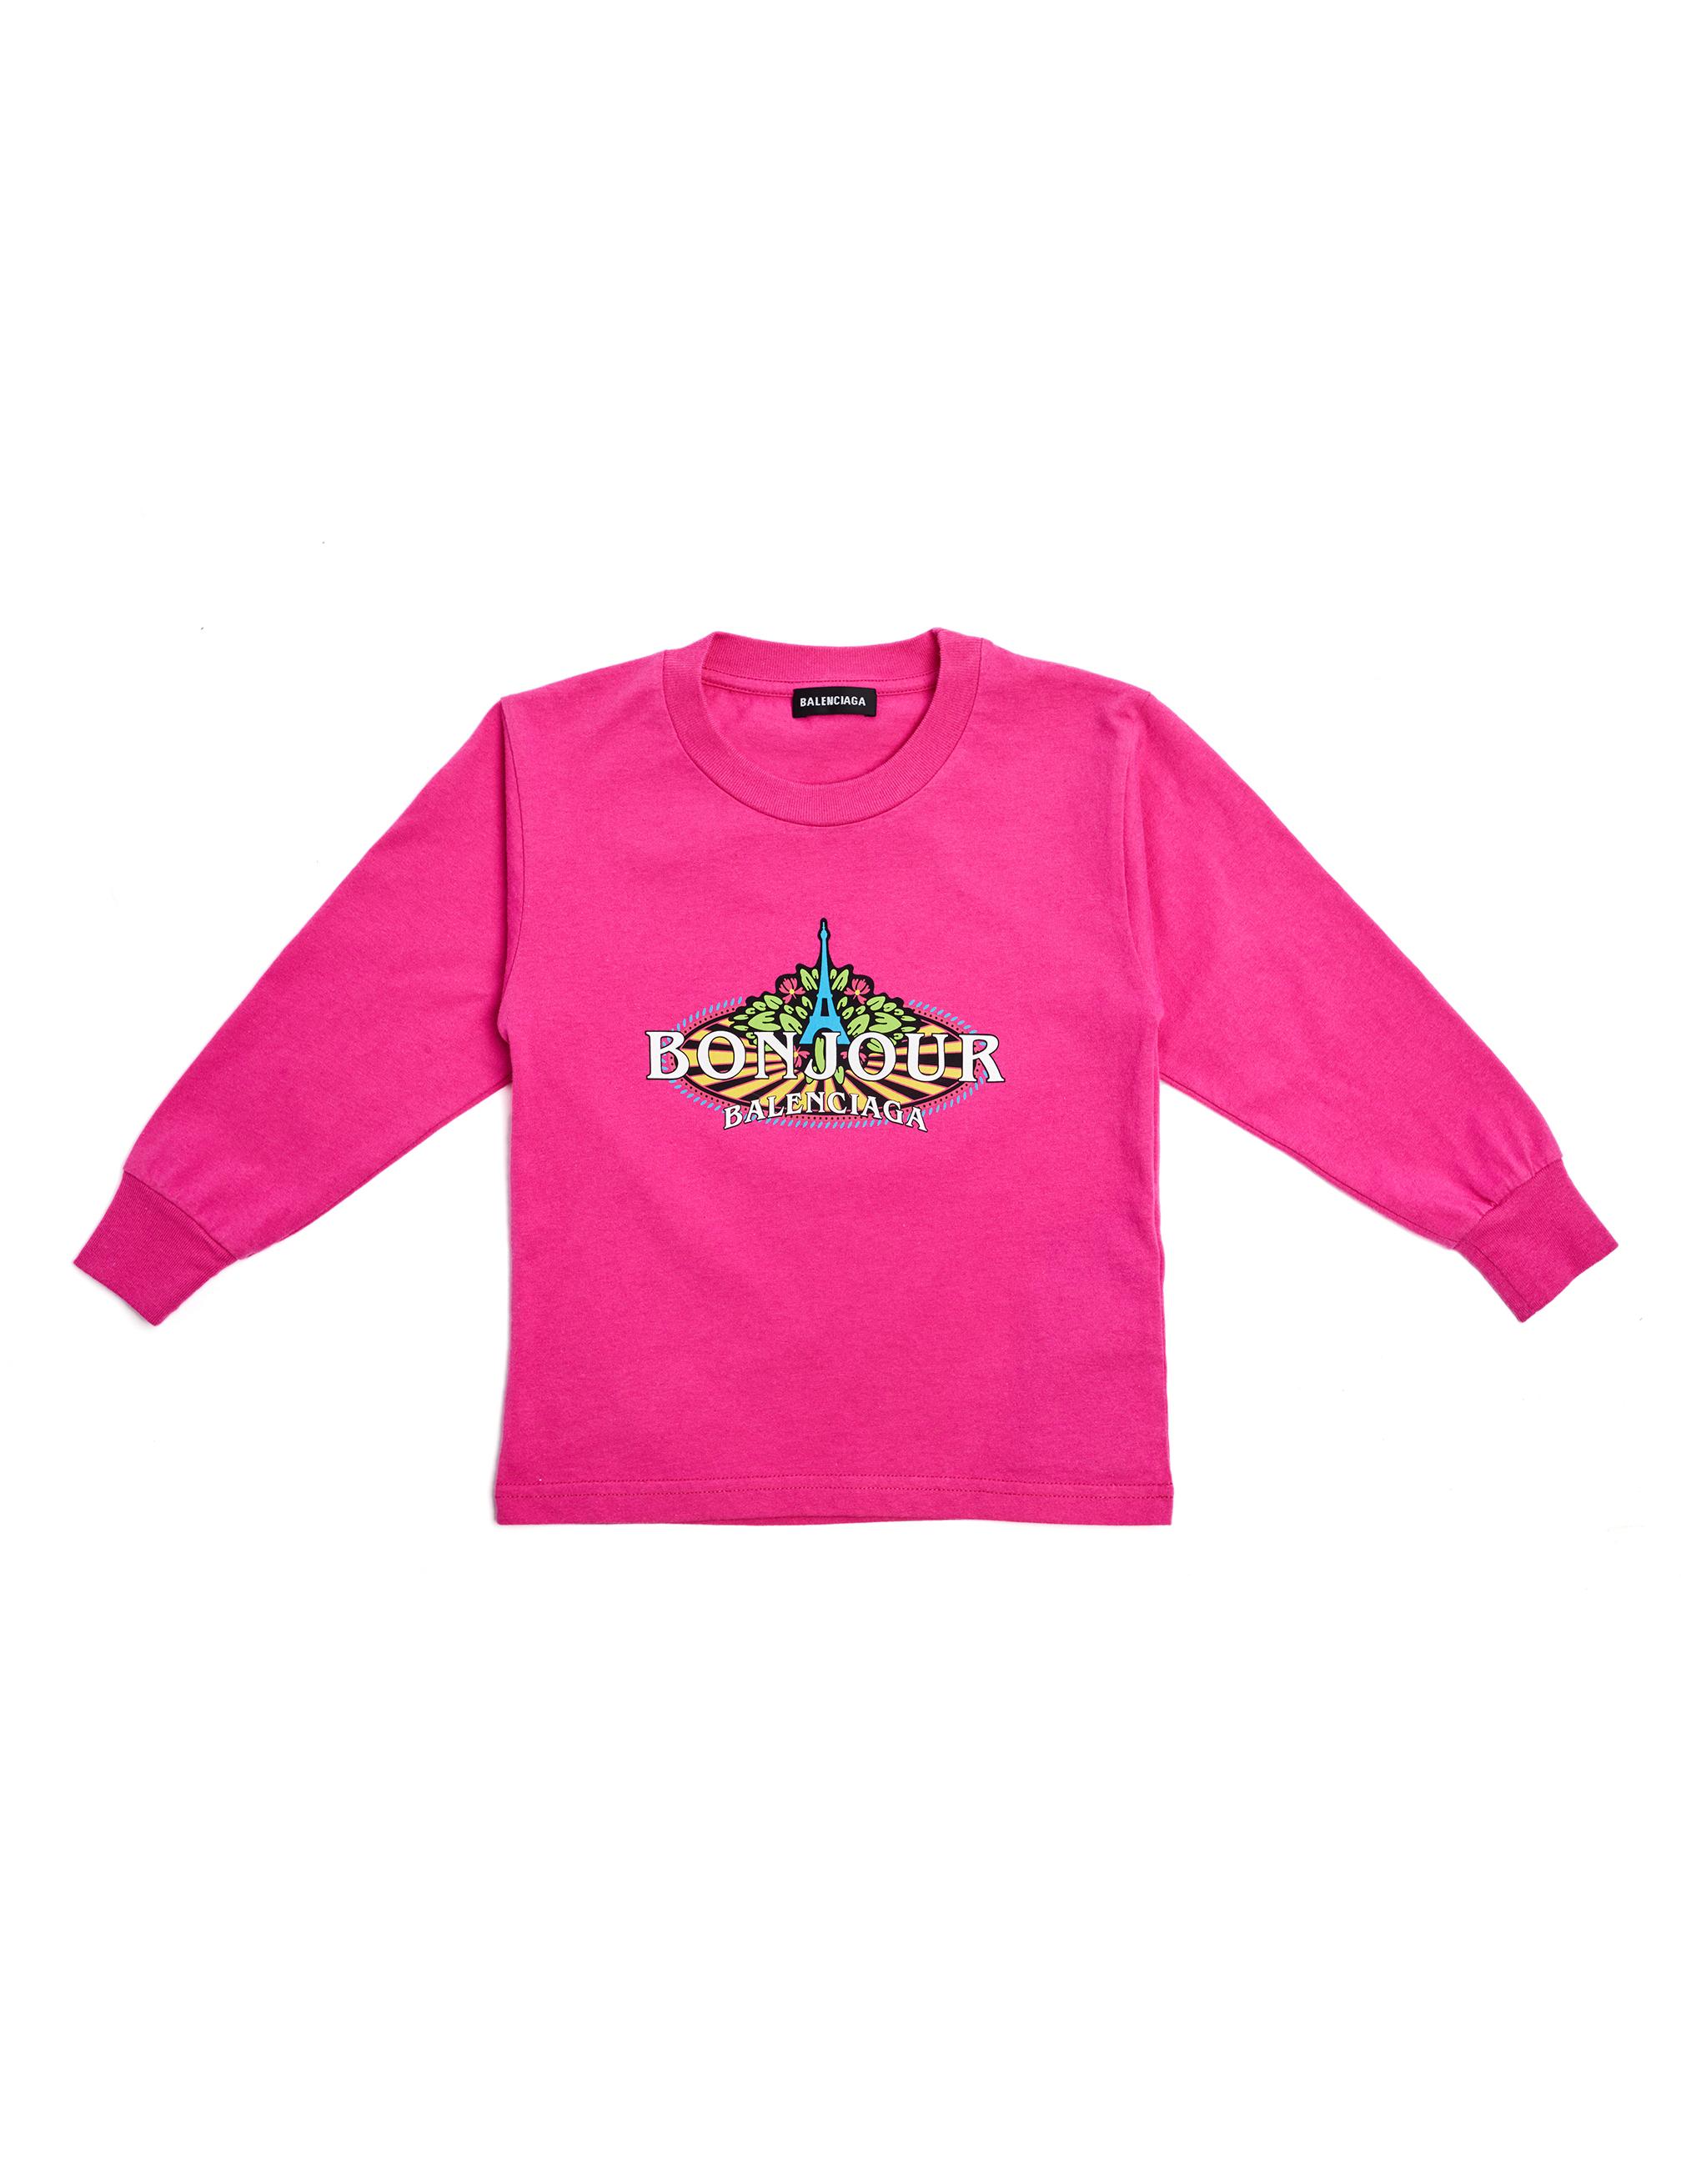 Balenciaga Kids Pink Cotton Bonjour L/S T-Shirt